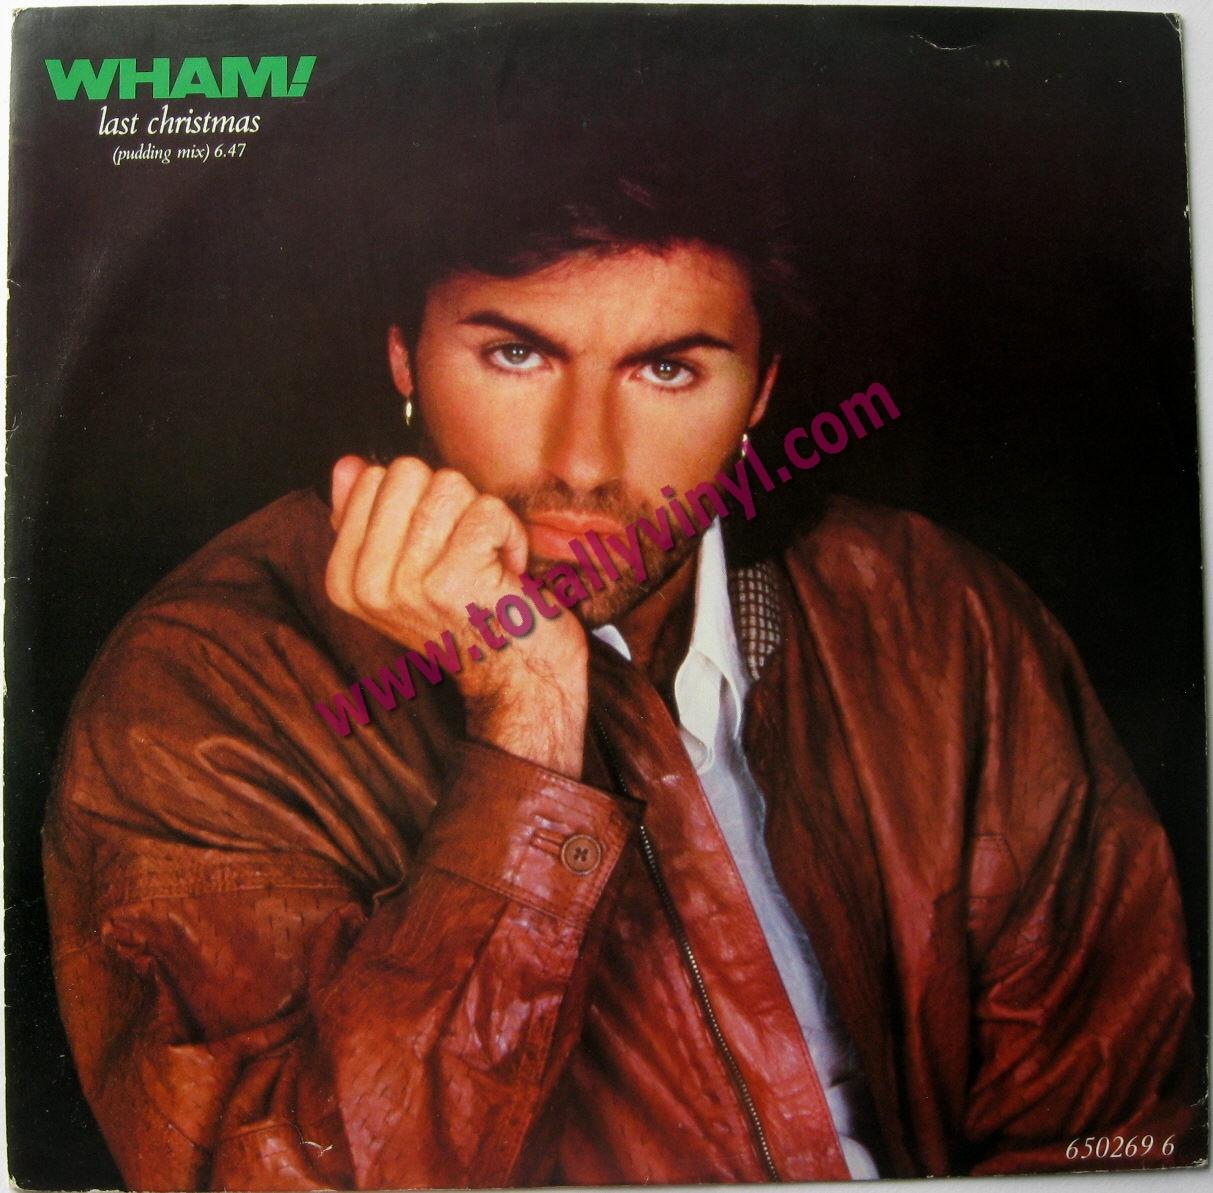 Last Christmas Album Cover.Totally Vinyl Records Wham Last Christmas Pudding Mix